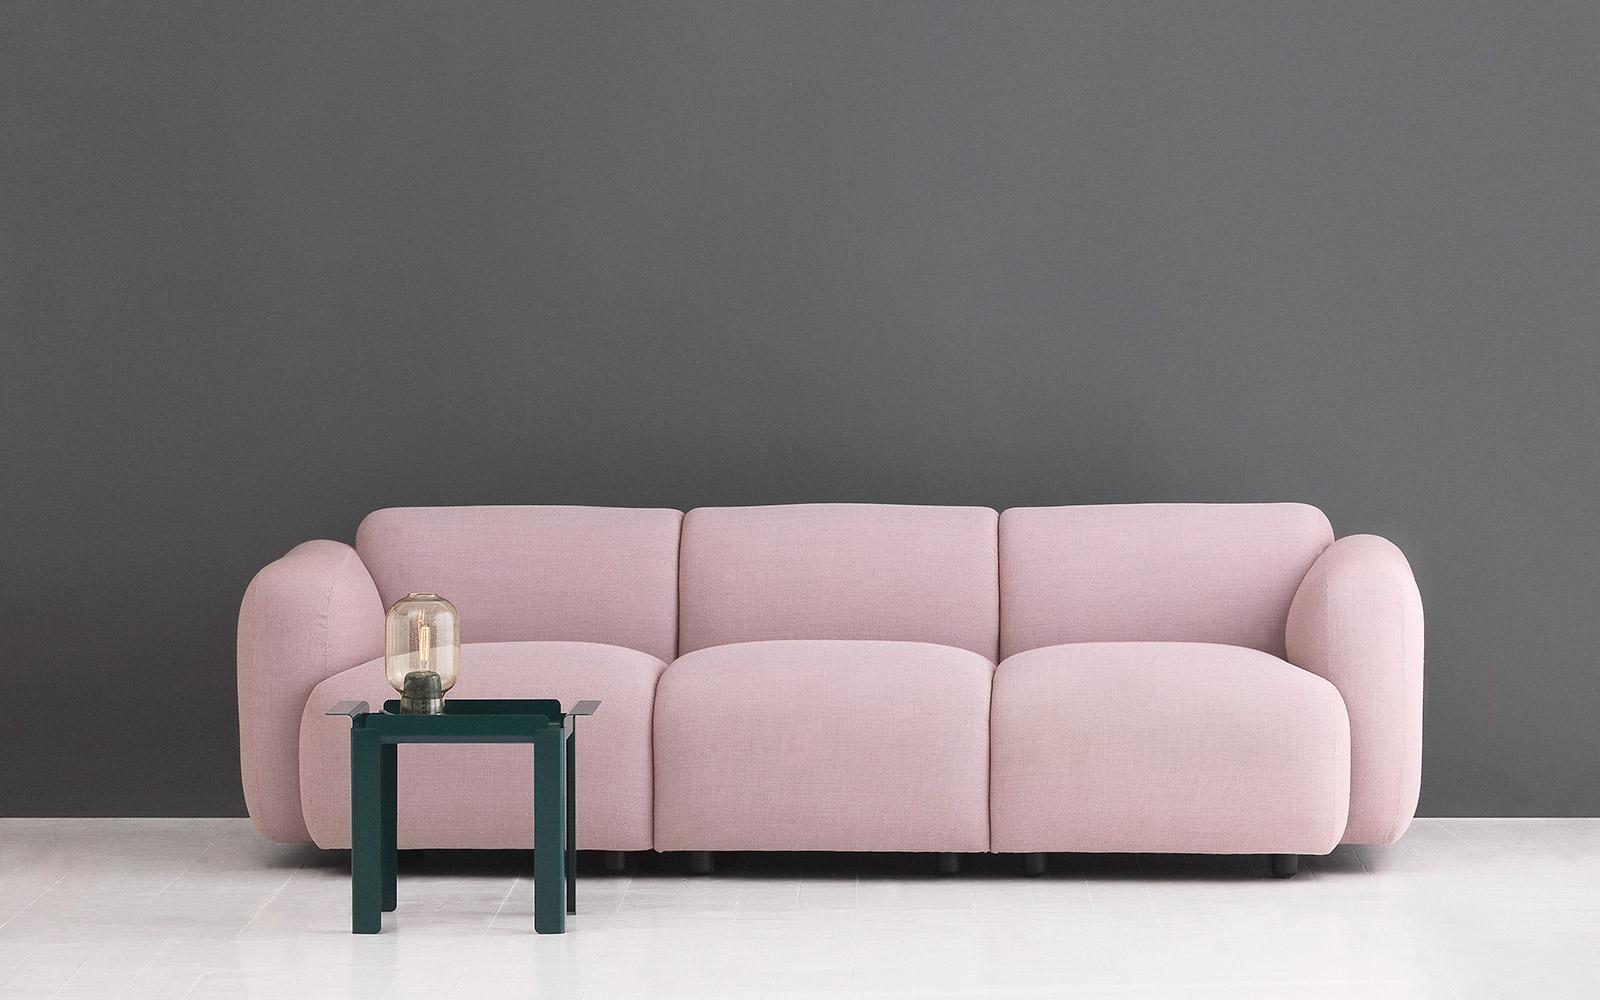 Bezaubernd Sofa Rose Foto Von Catalogue Spring 2015 | Normann Copenhagen